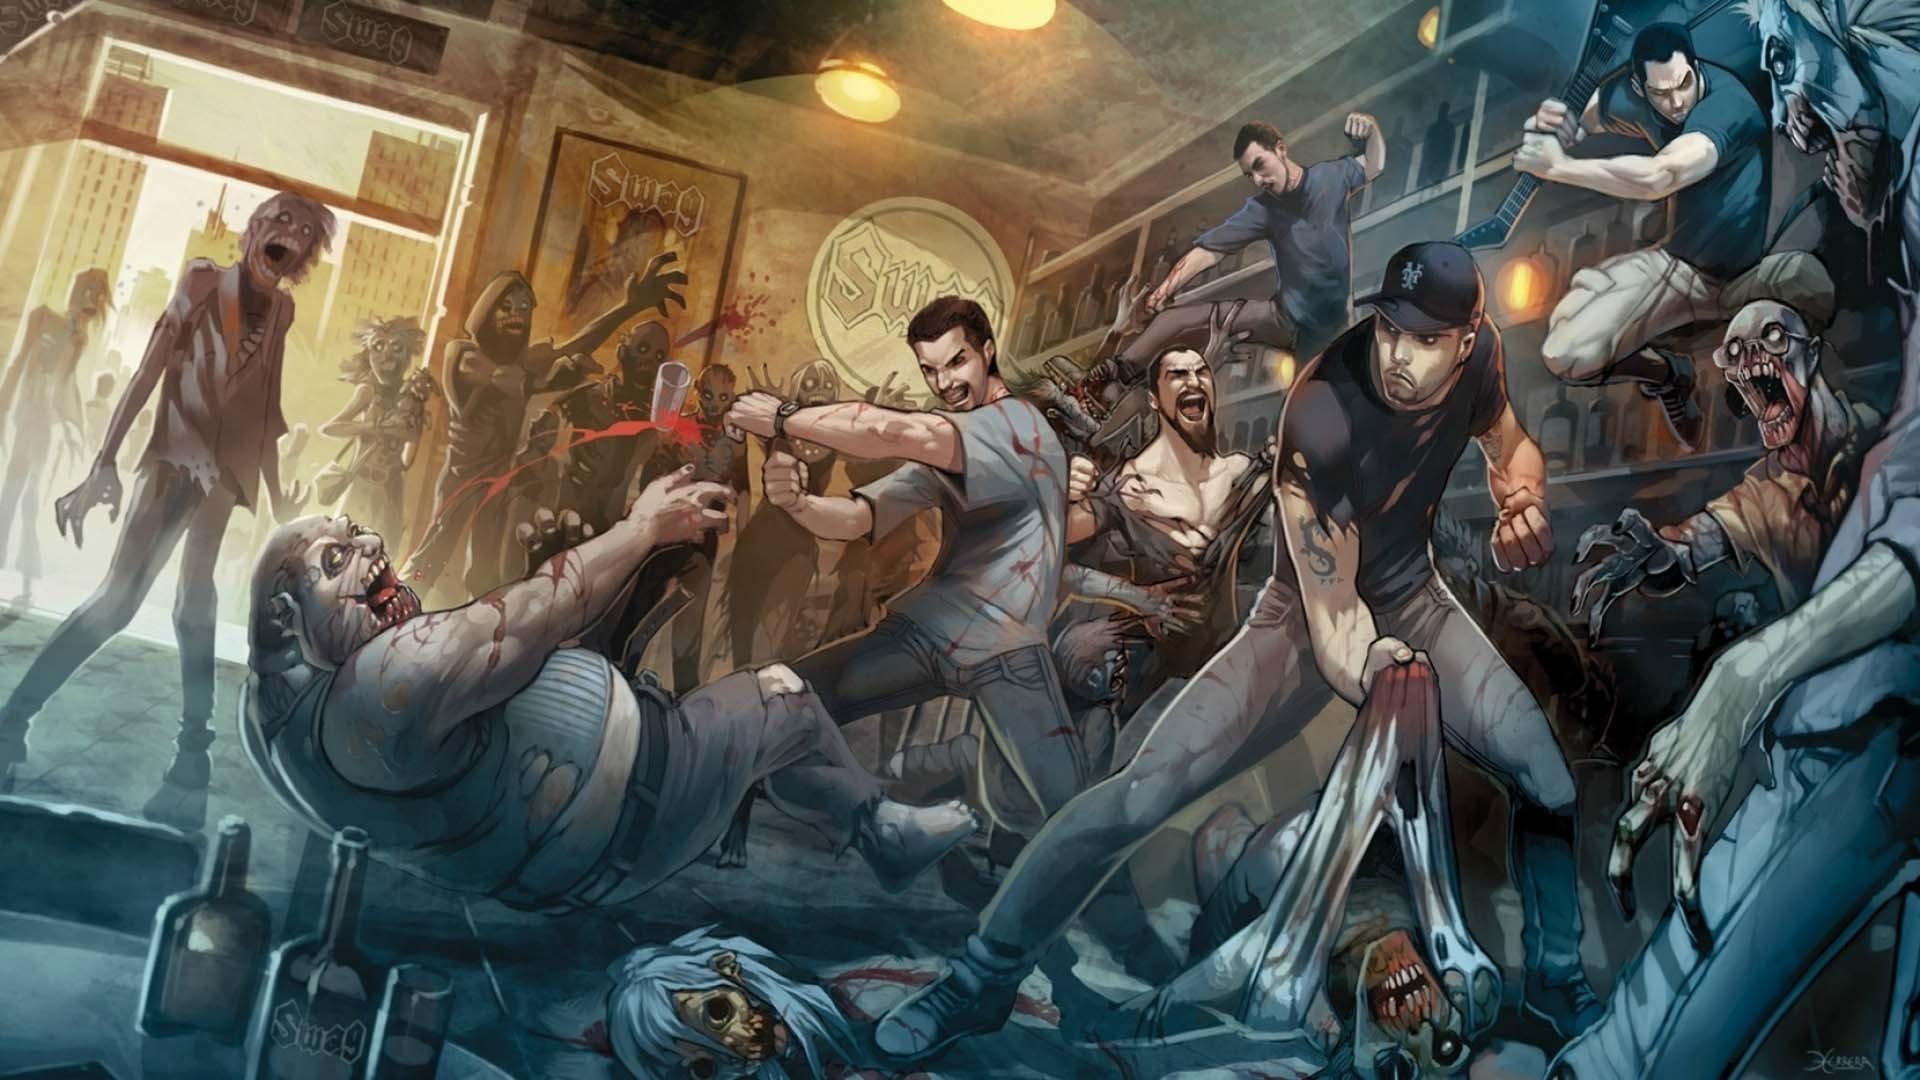 Zombie Desktop Wallpaper – WallpaperSafari